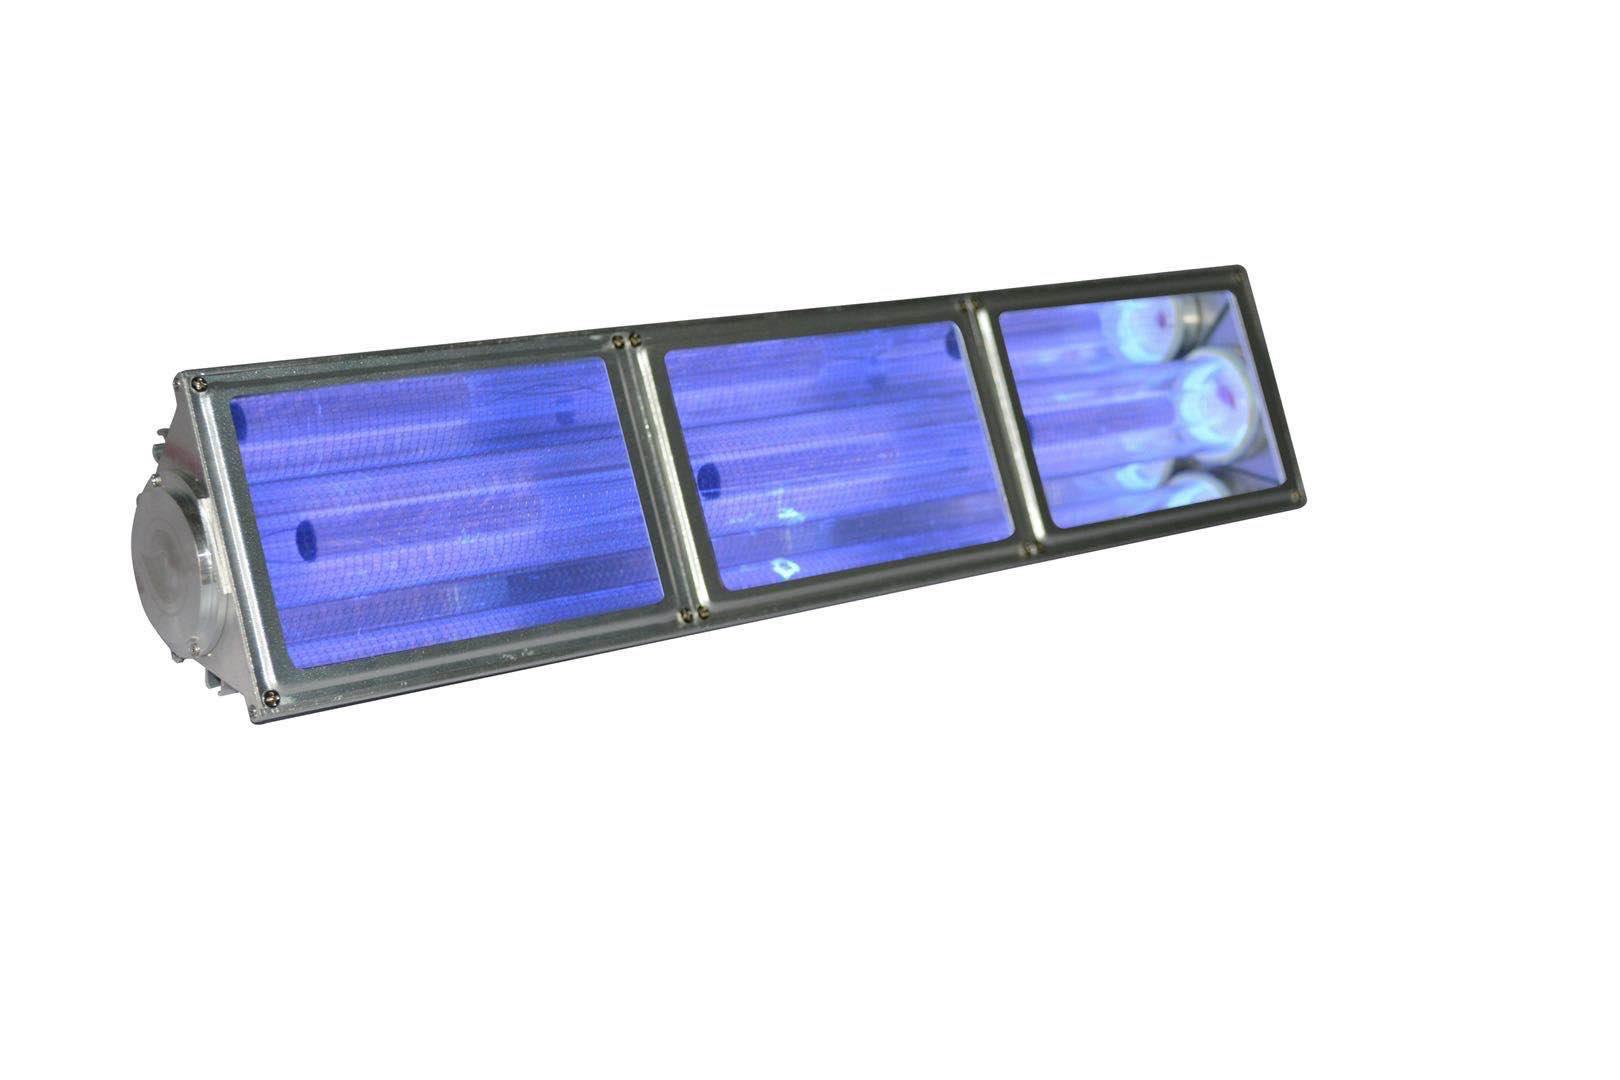 60w-krcl-excimer-module-filtered-222nm-peak-far-uvc-ap-uvgi